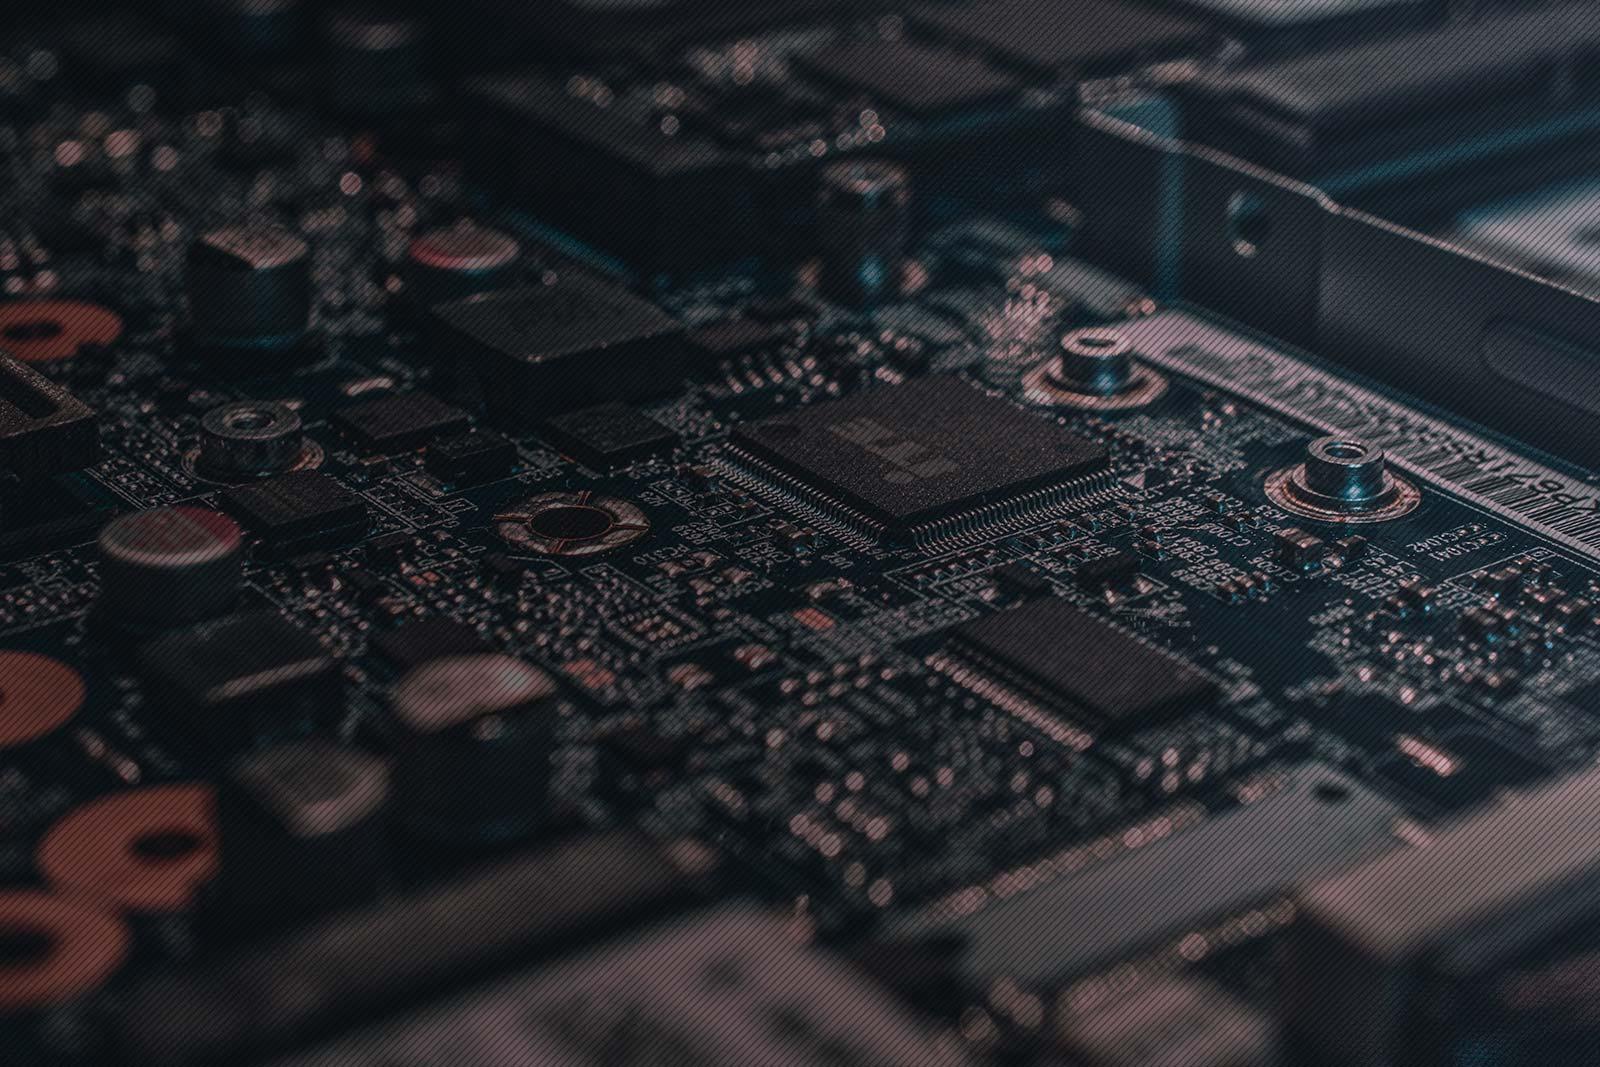 Bakgrundsbild Anpassade IoT System